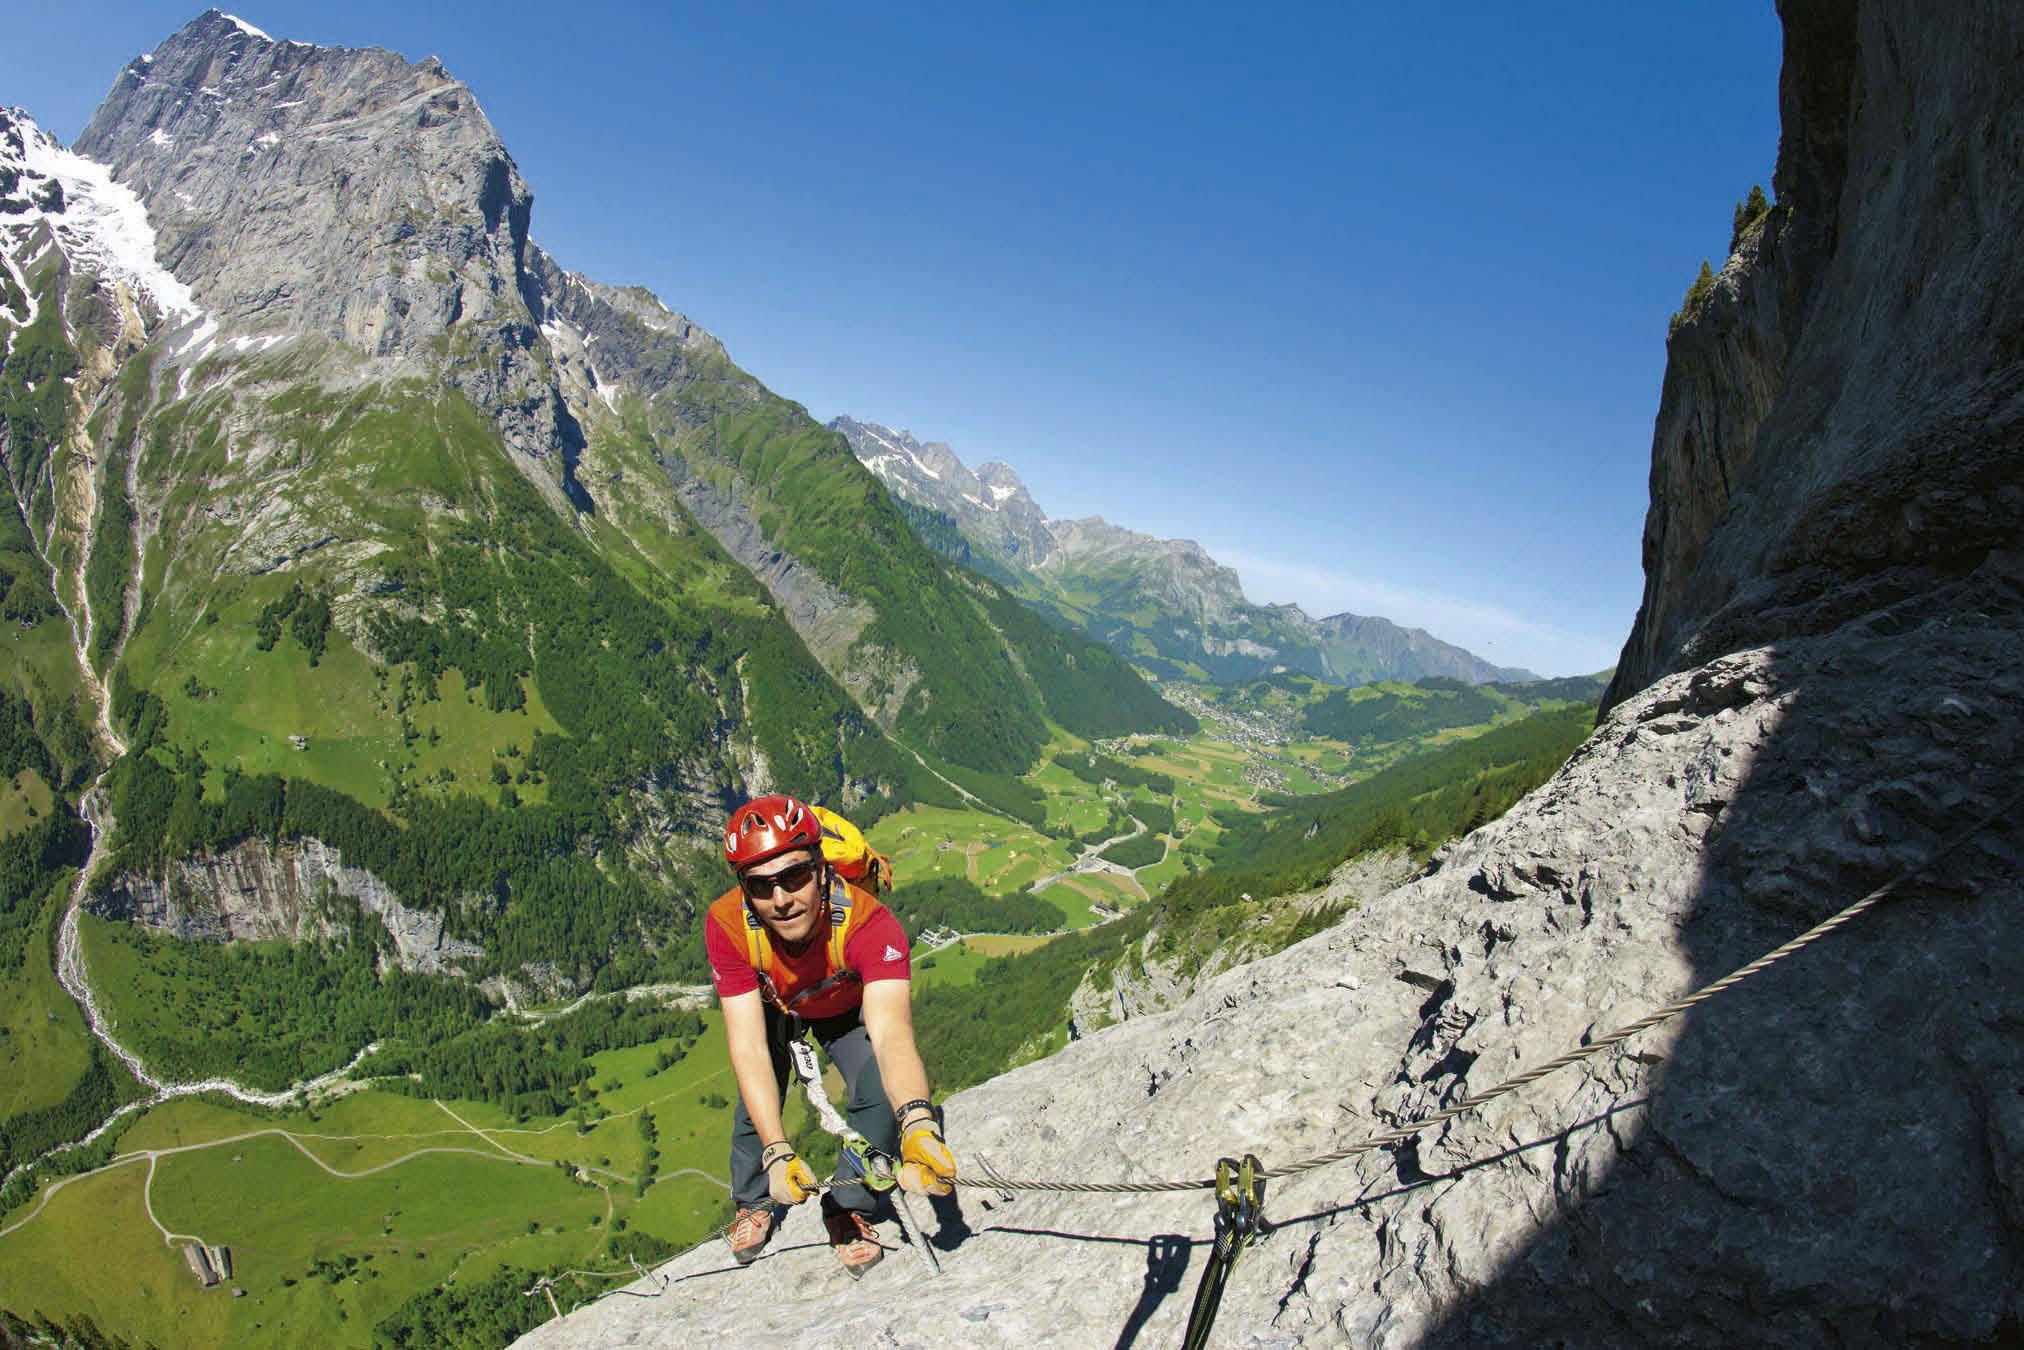 Klettersteig-Paradies Engelberg